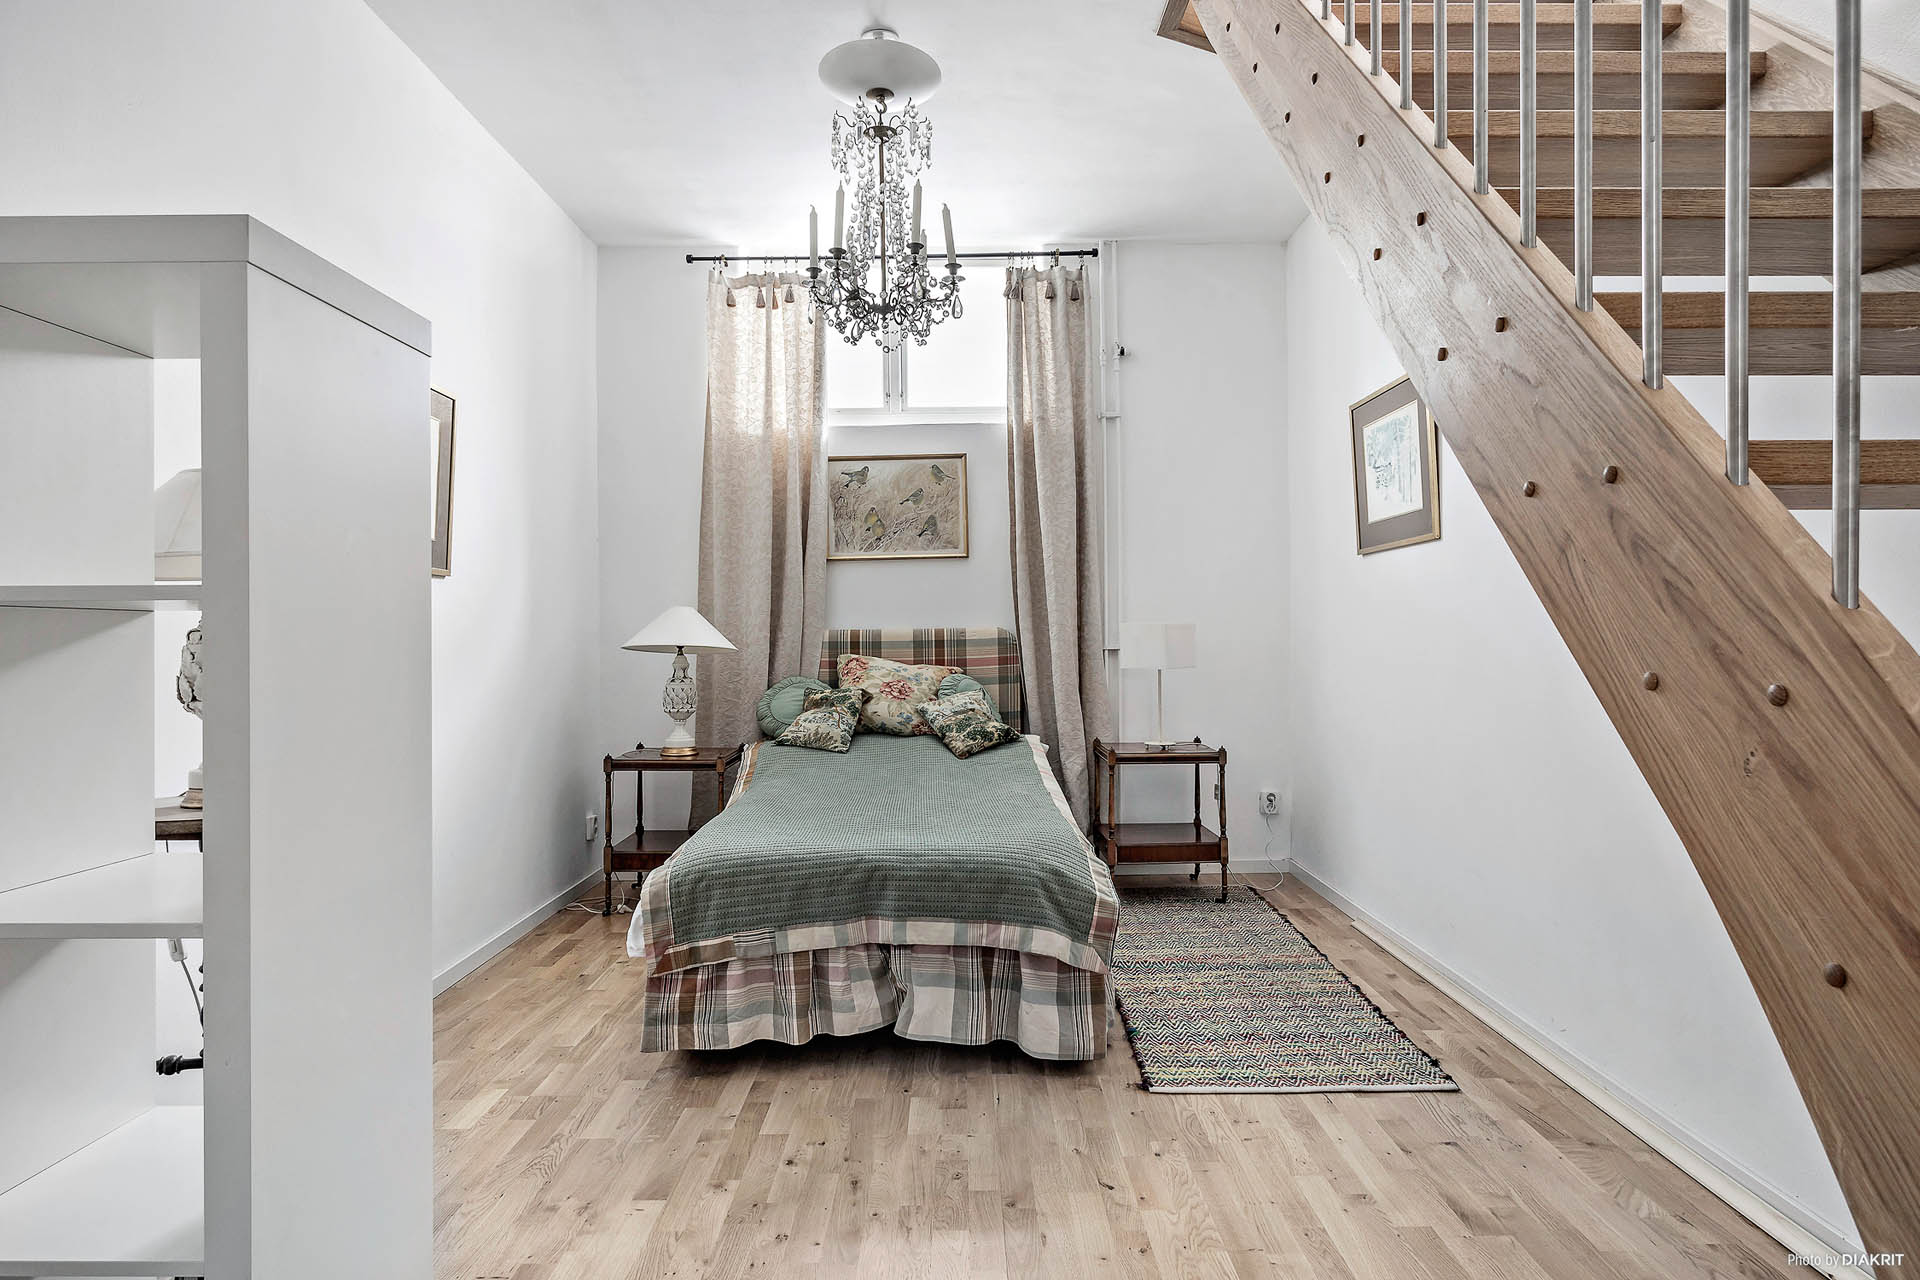 Sovrum en trappa ned